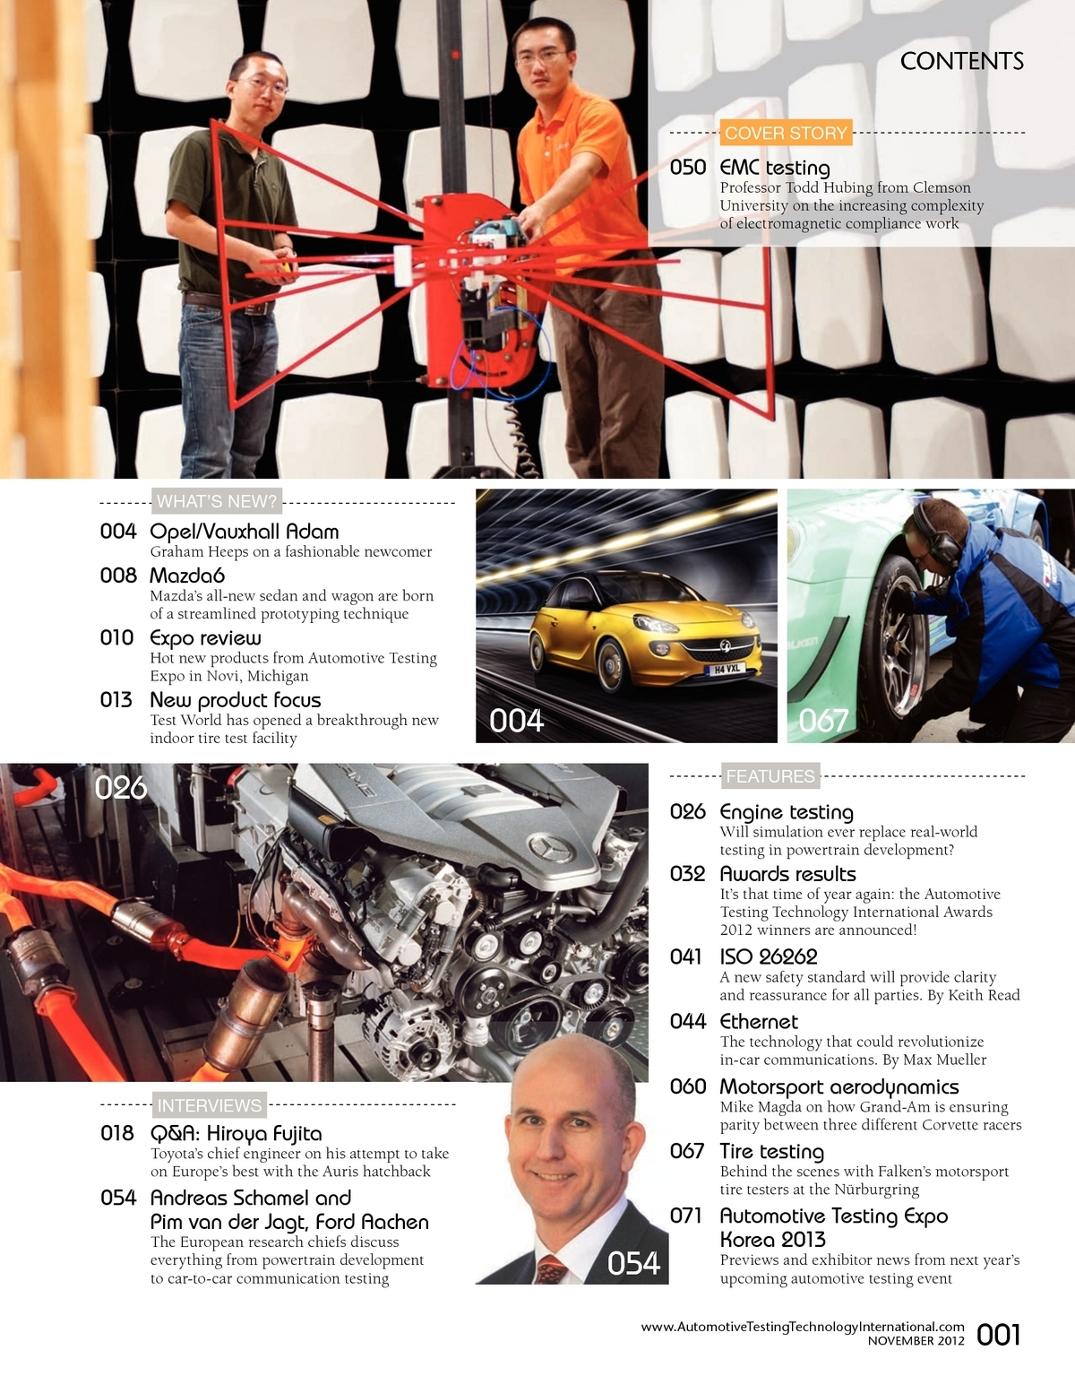 November 2012 Automotive Testing Technology International - UKi ...